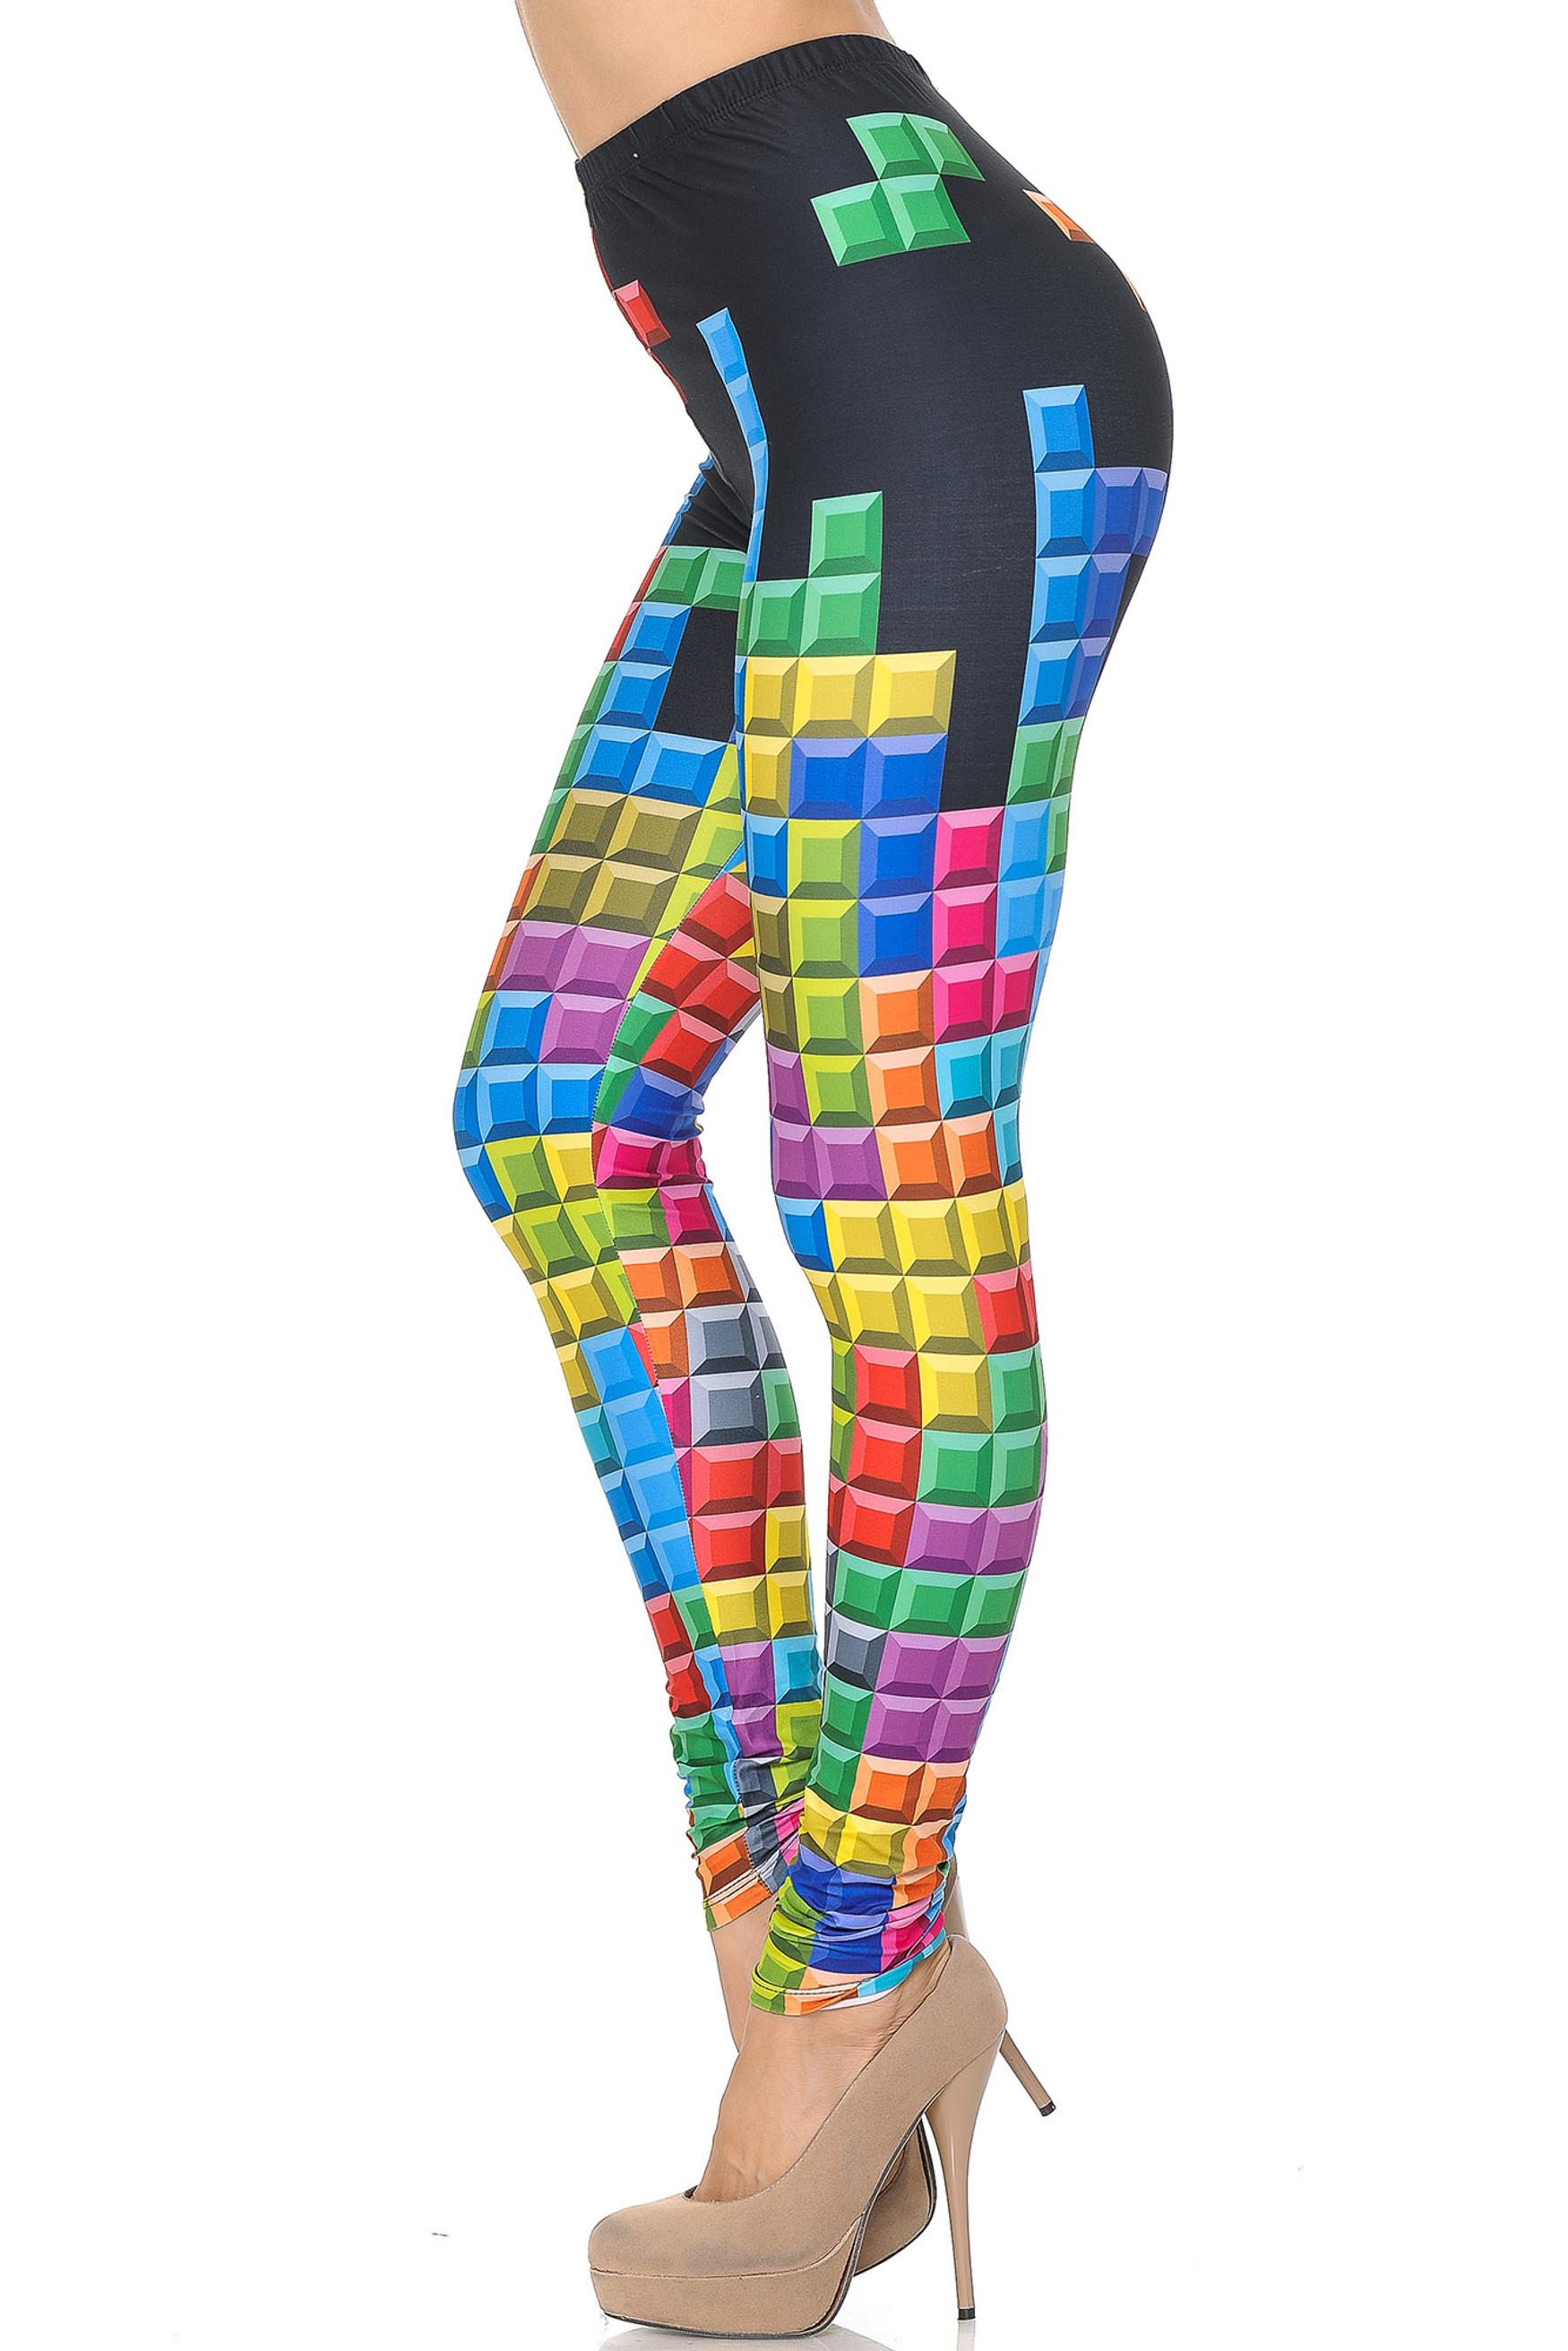 Creamy Soft Tetris Extra Small Leggings - USA Fashion™